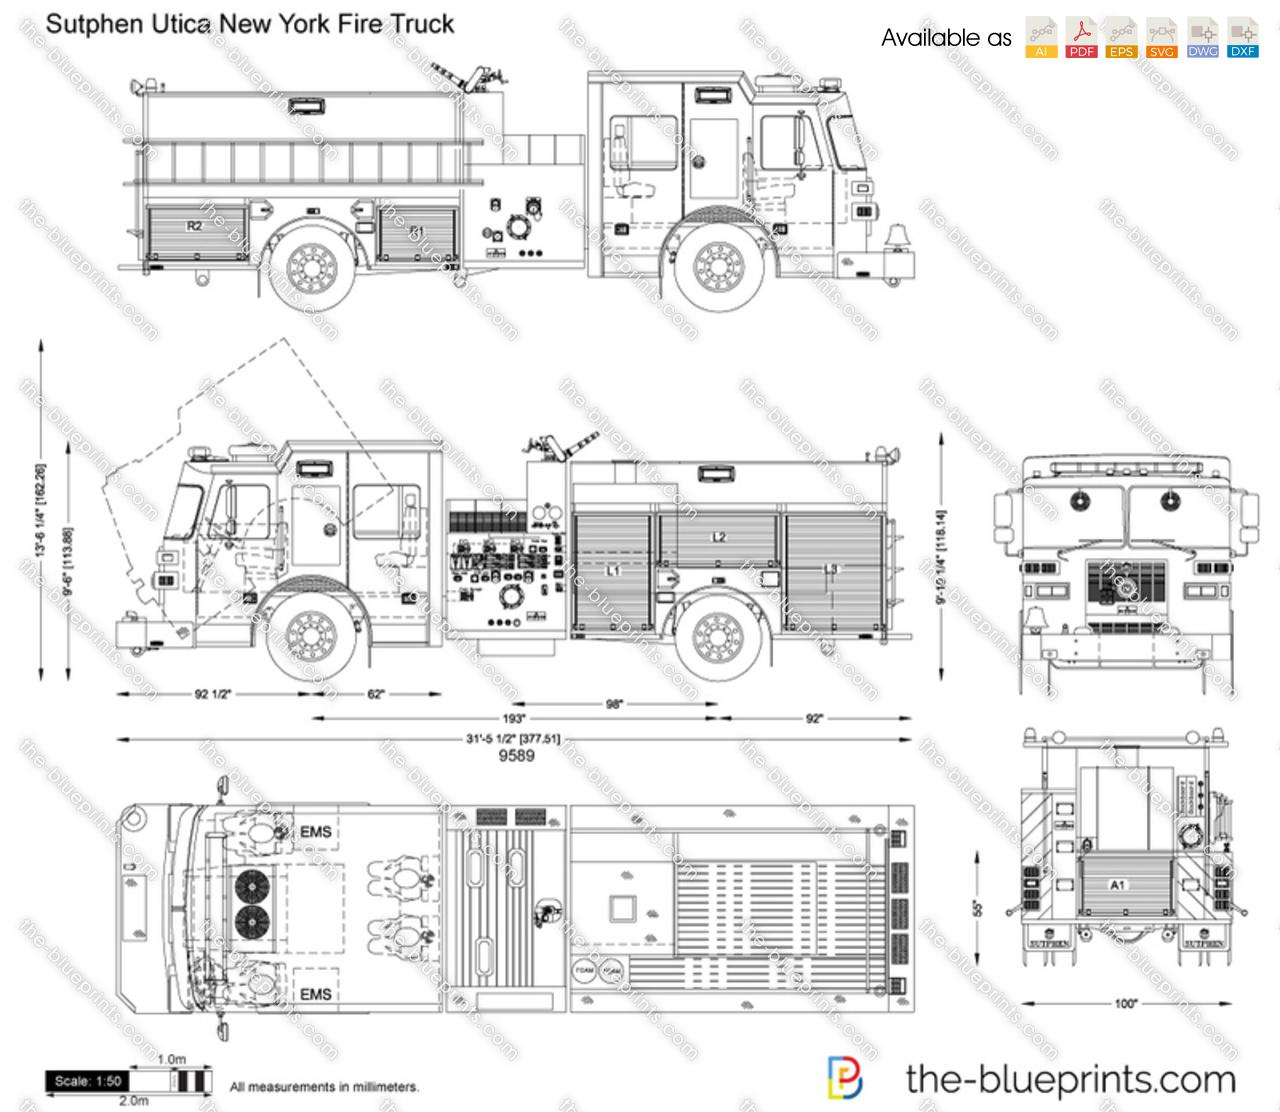 hight resolution of sutphen utica new york fire truck vector drawing